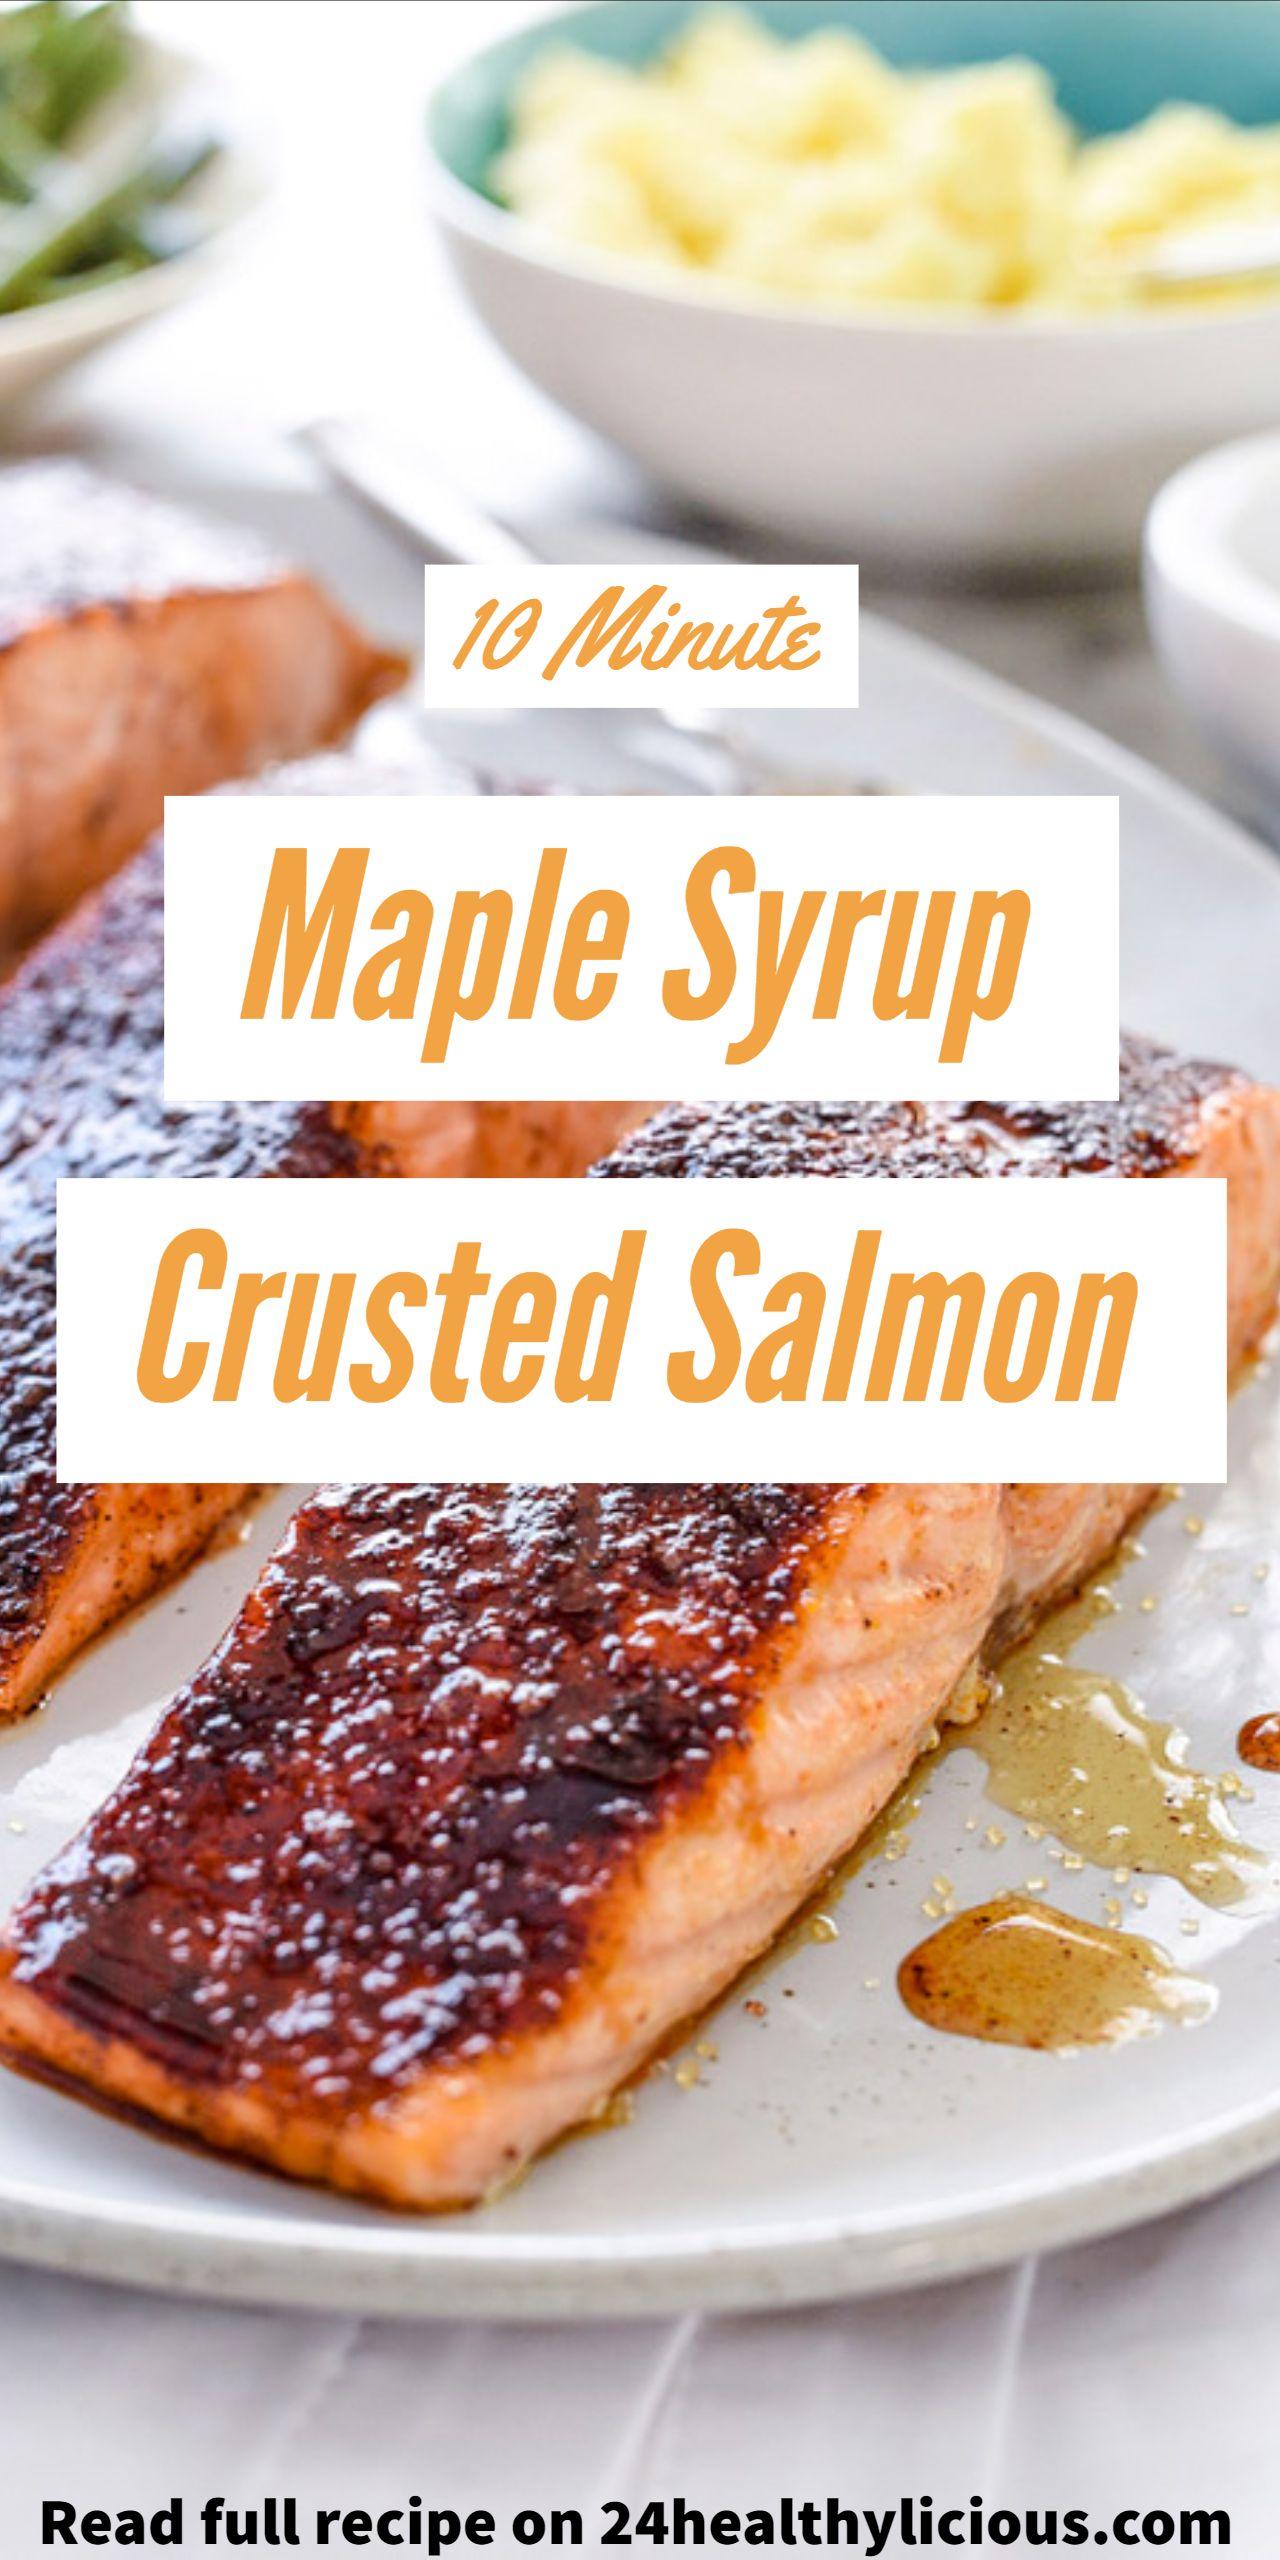 10-Minute Maple Syrup Crusted Salmon Recipe  #salmonrecipes